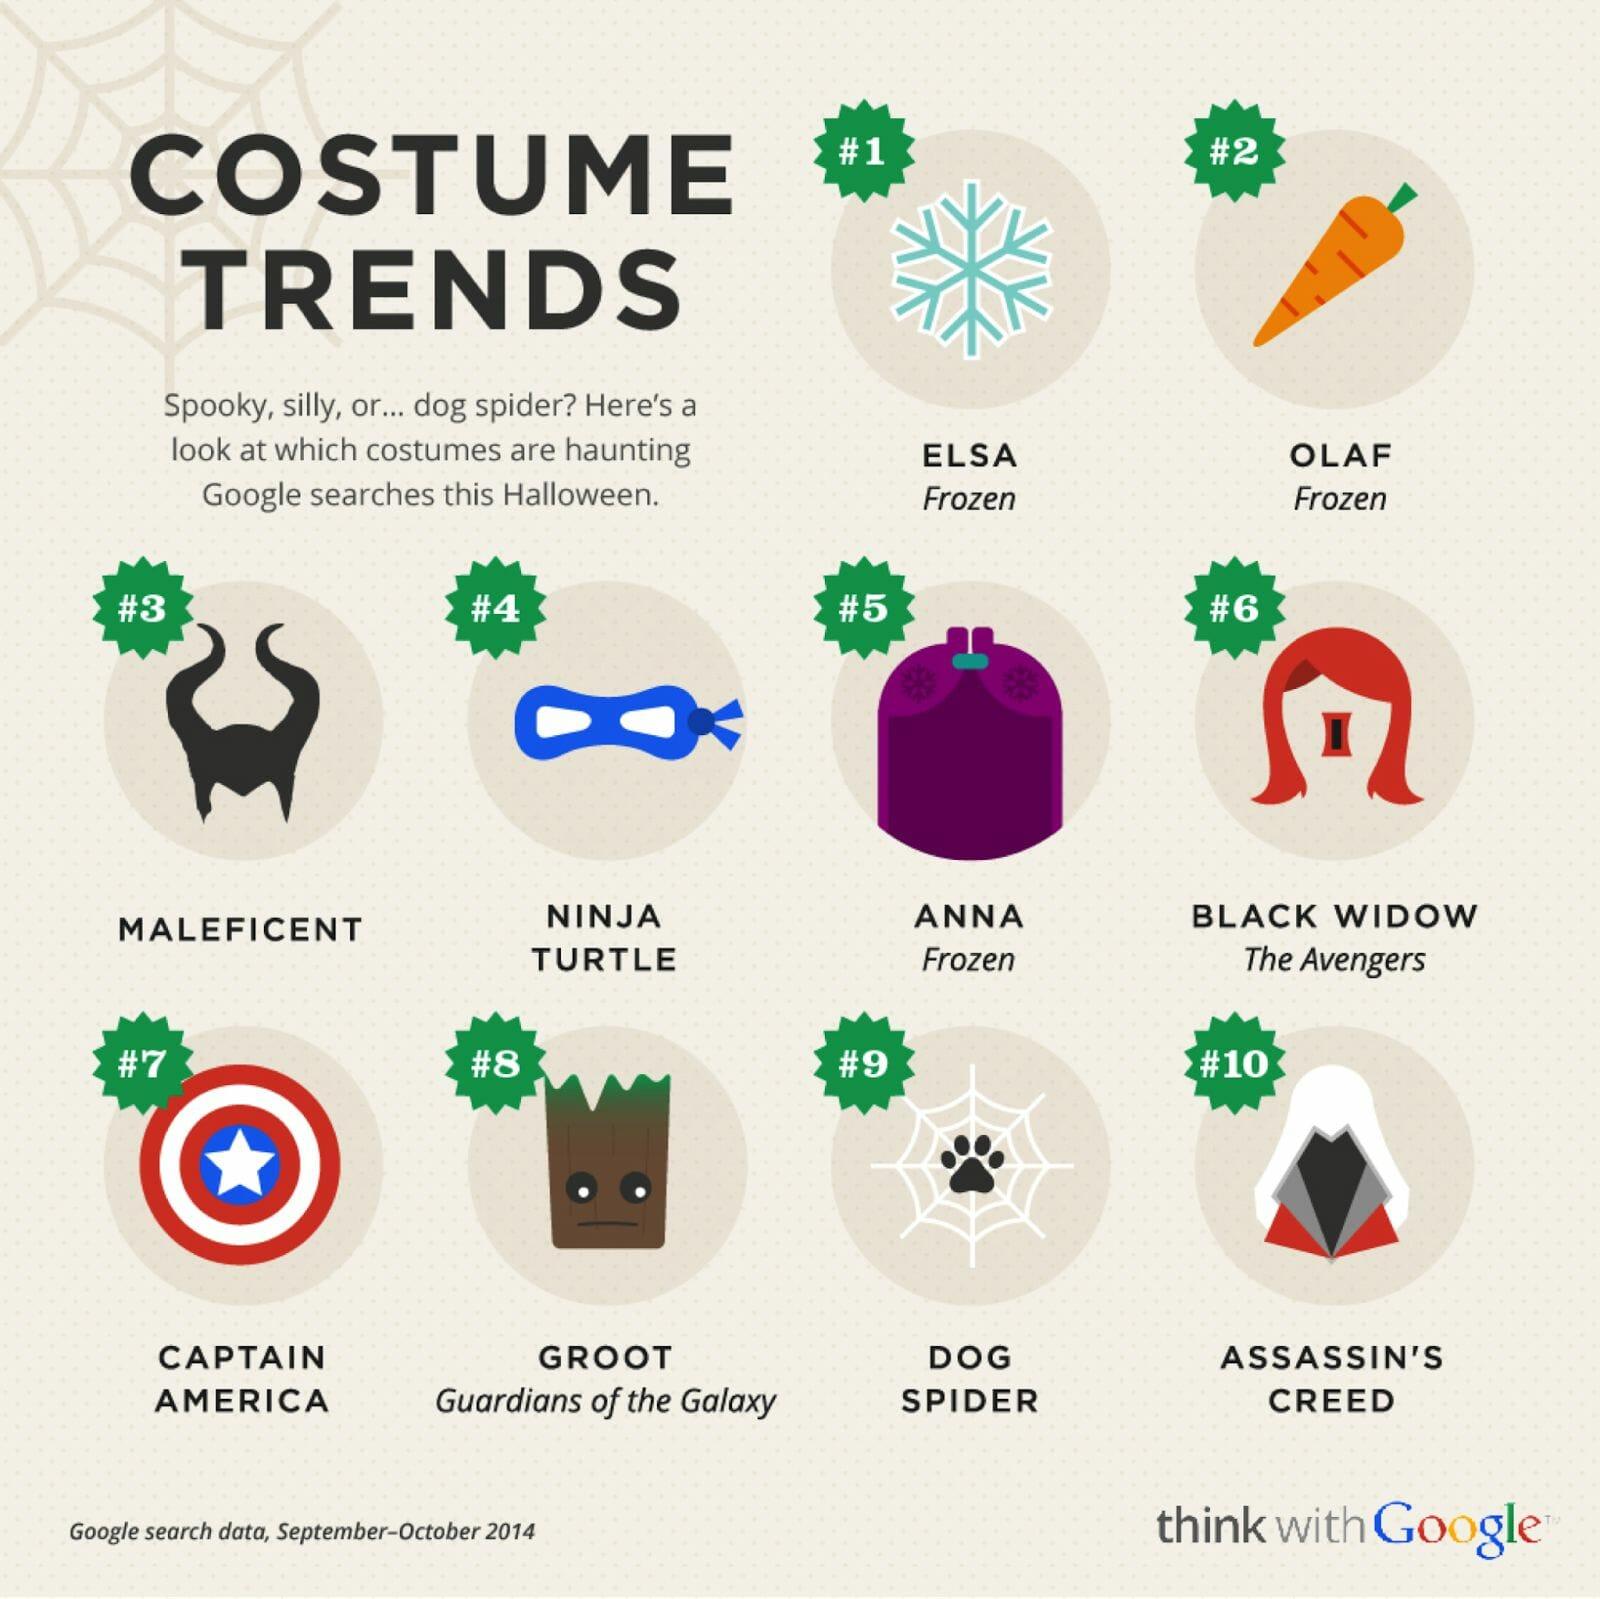 Halloween Blog Post Costume Trends Infographic